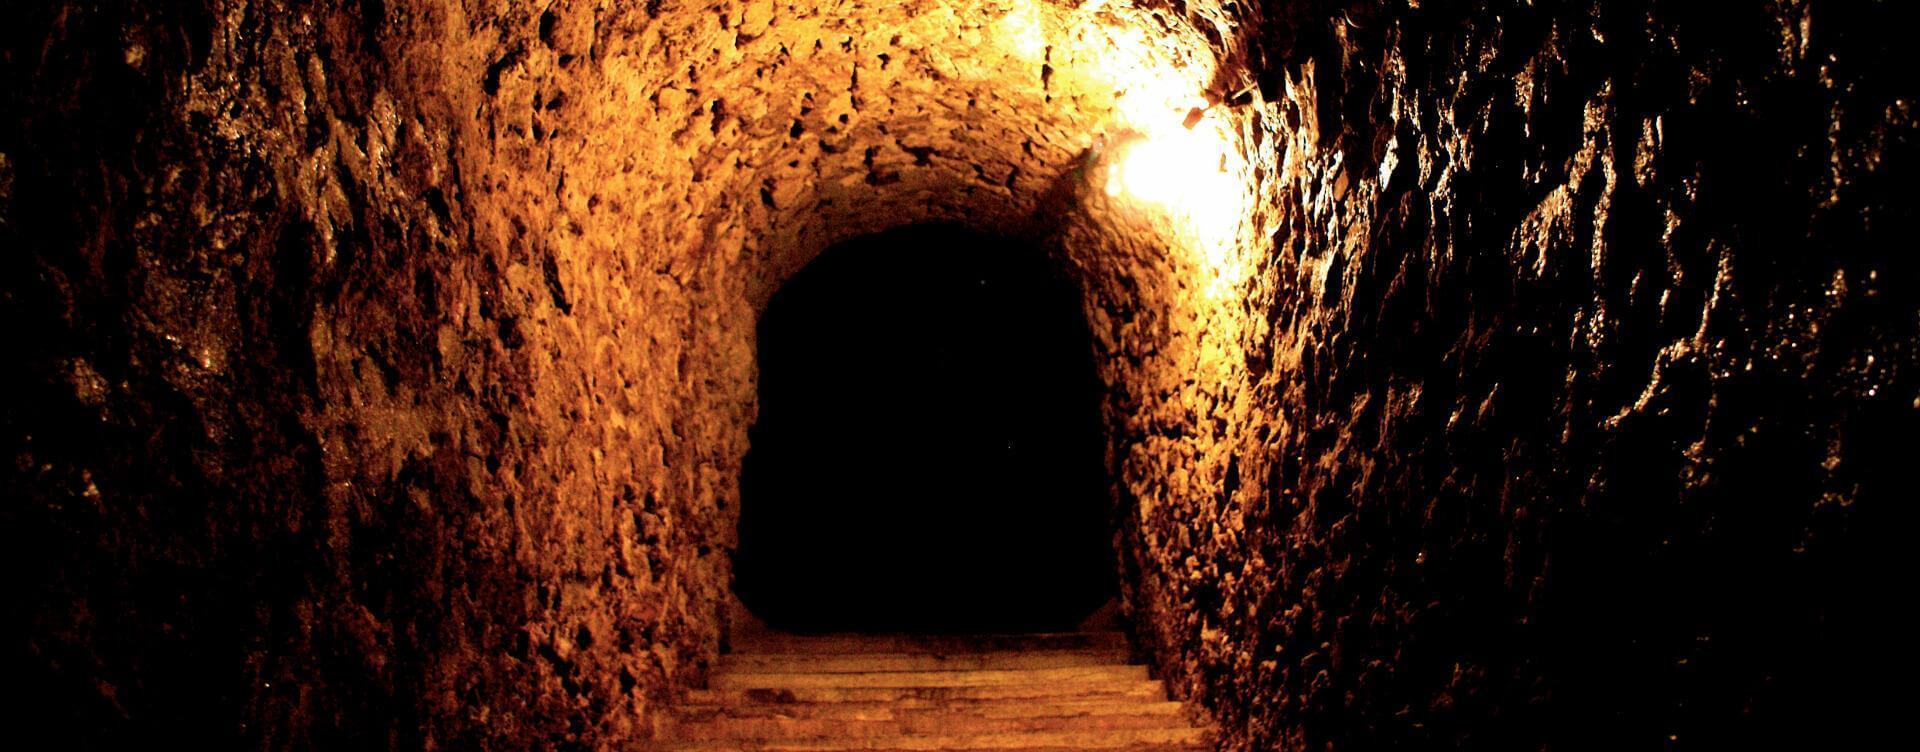 entree de caves